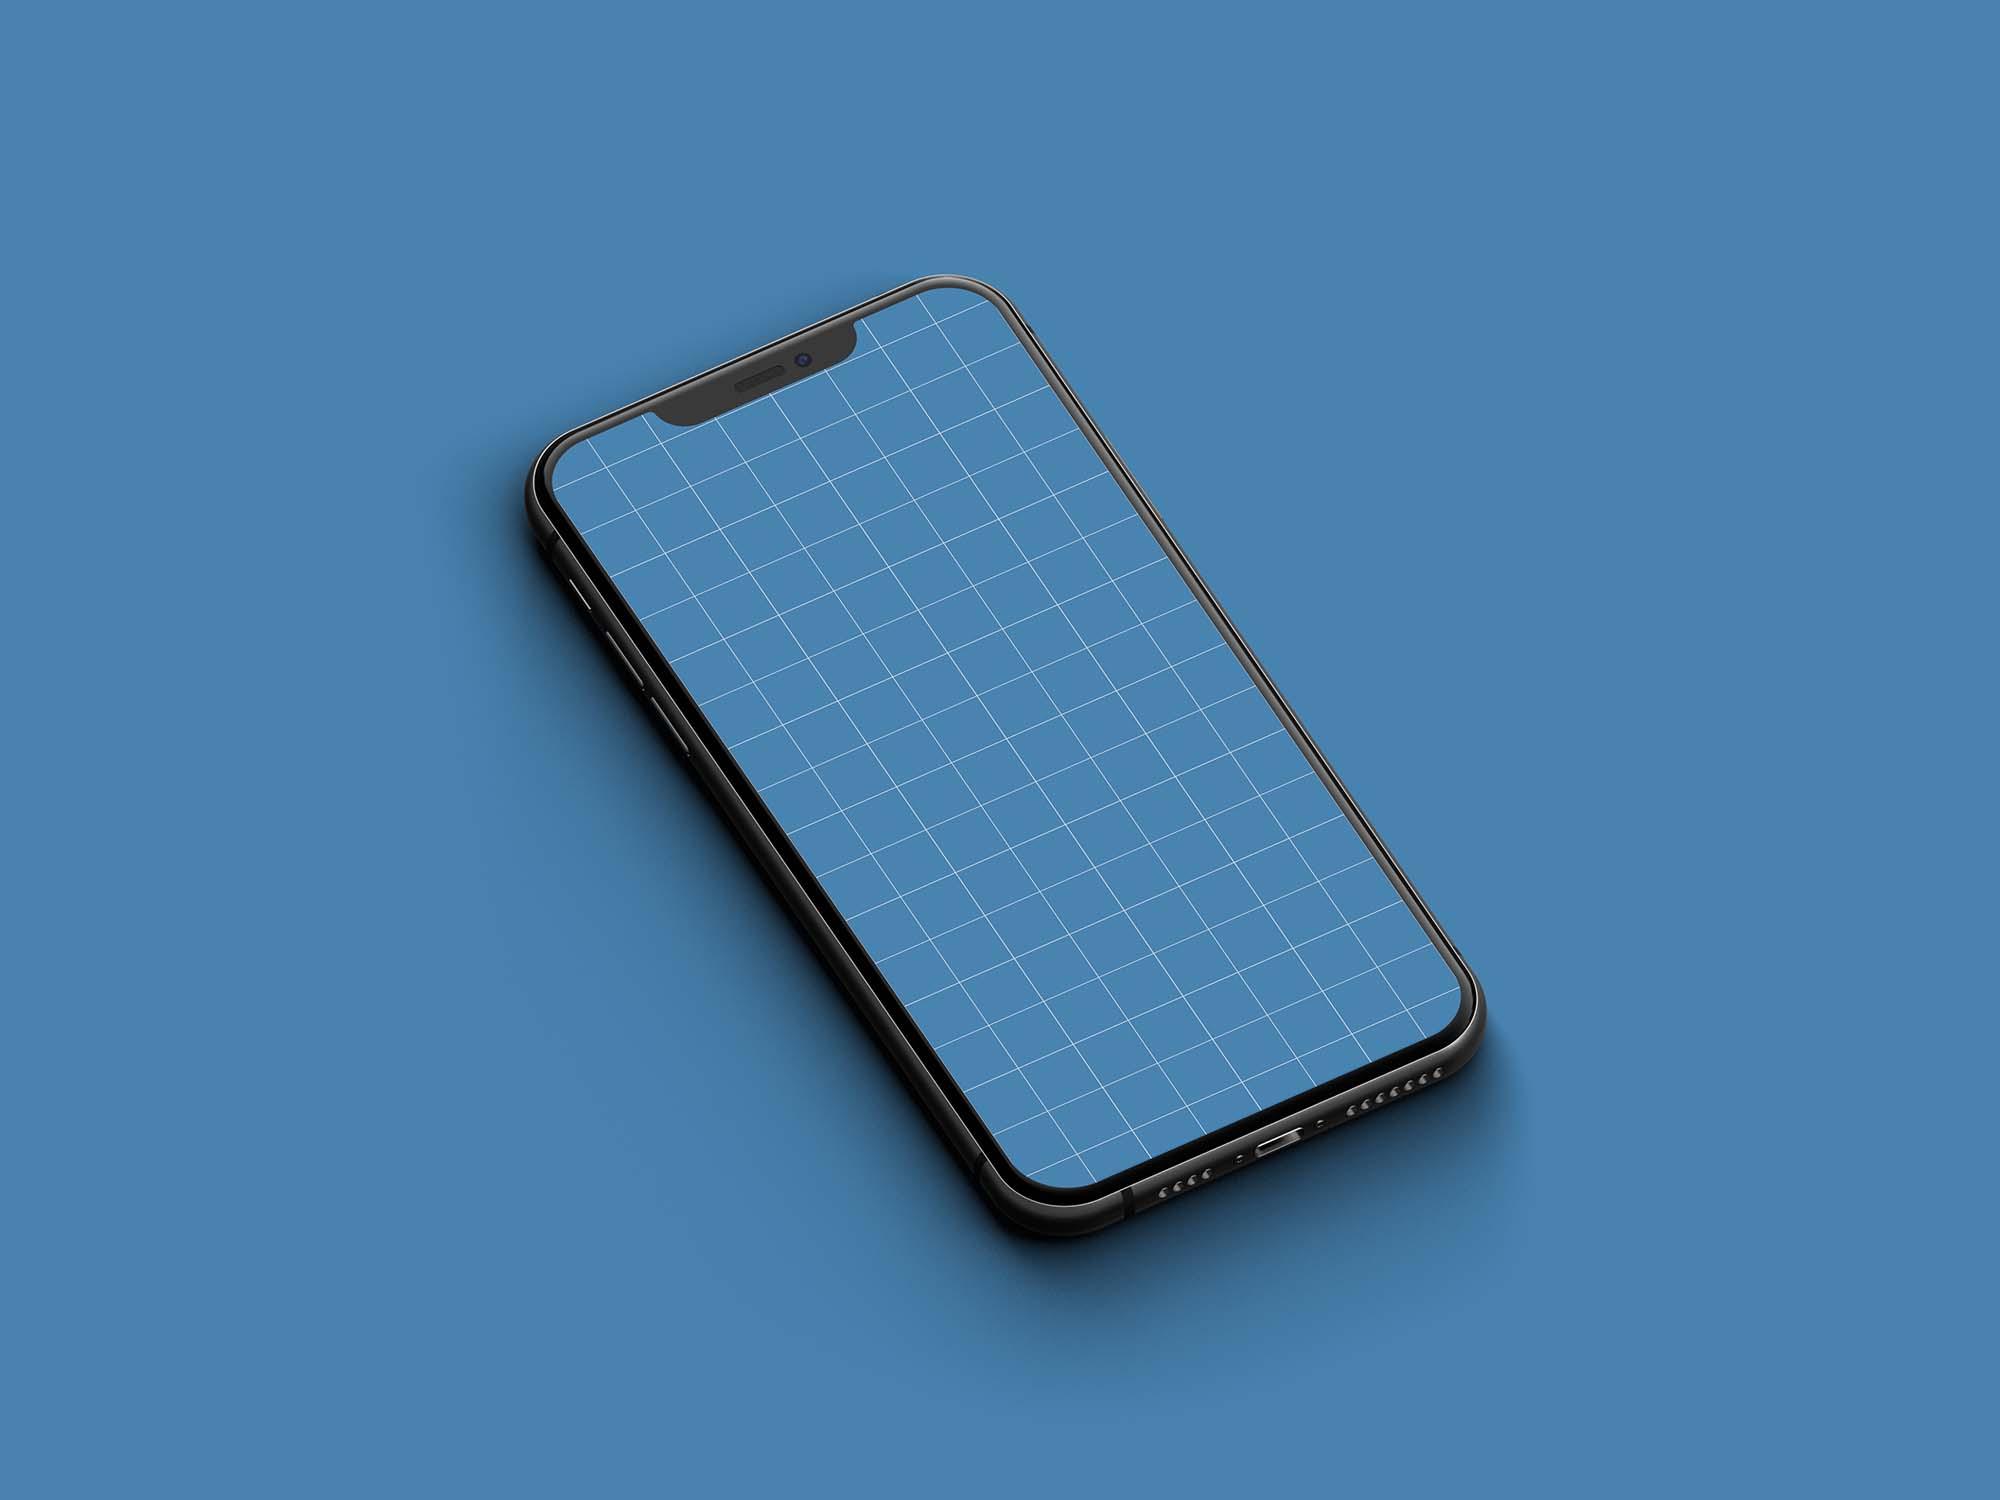 Isometric iPhone 11 Pro Mockup 2